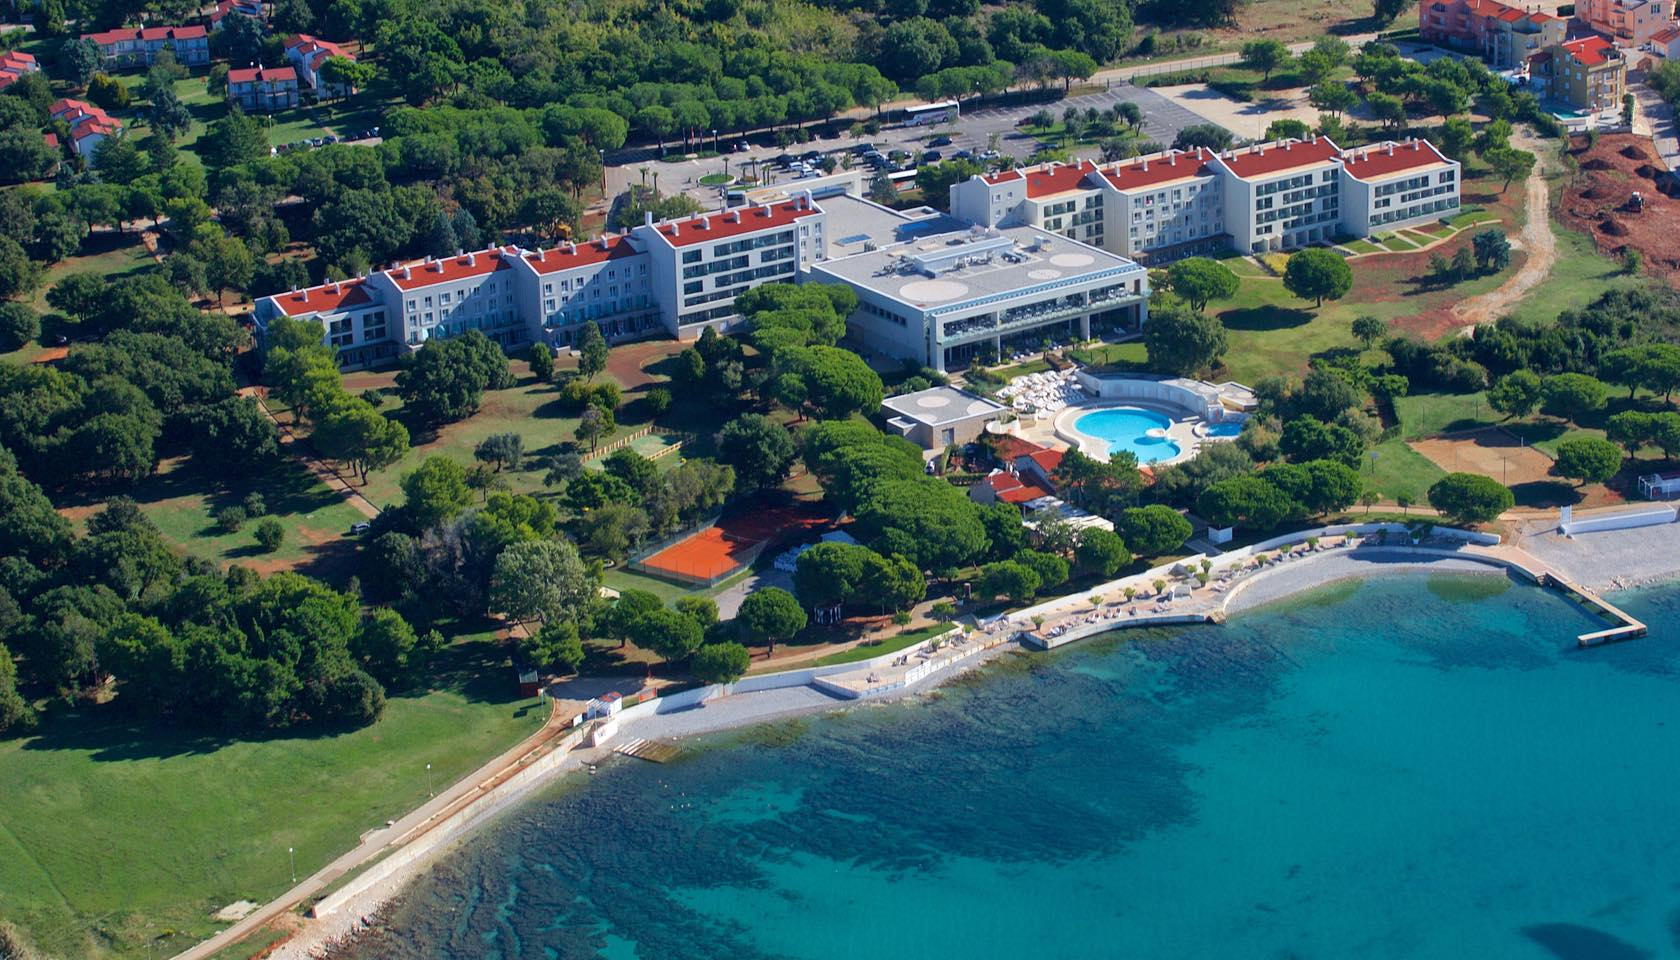 Hotel Park Plaza Belvedere Medulin Hotel Arenaturist